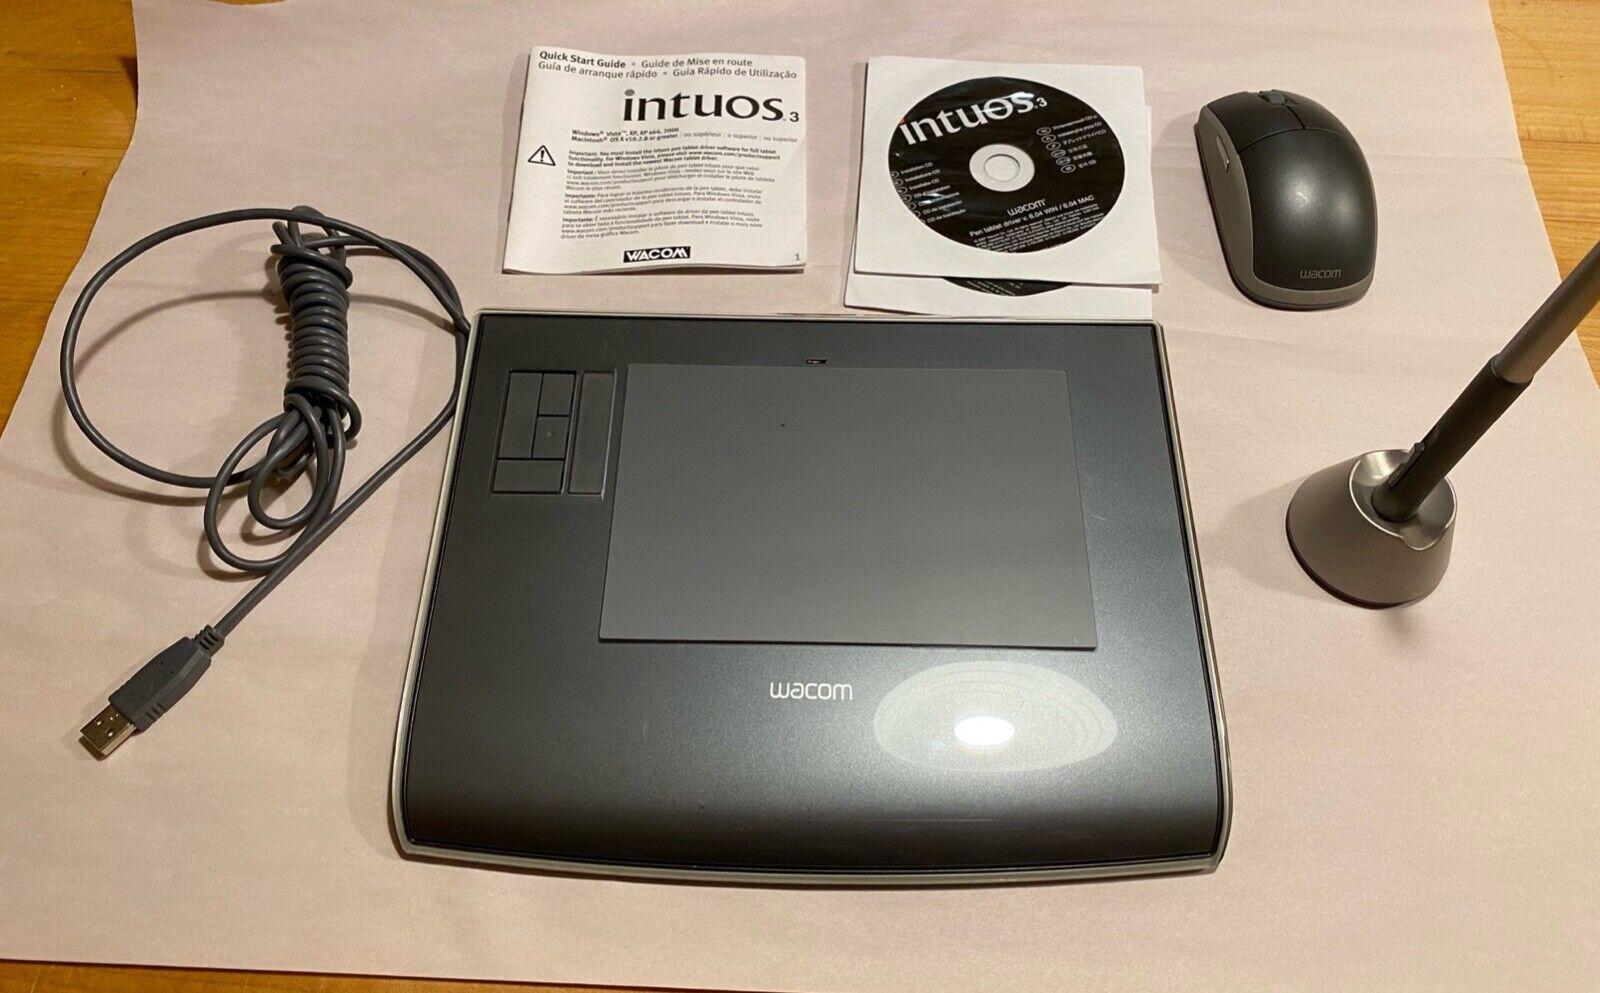 Tablet wp8060u driver for macbook